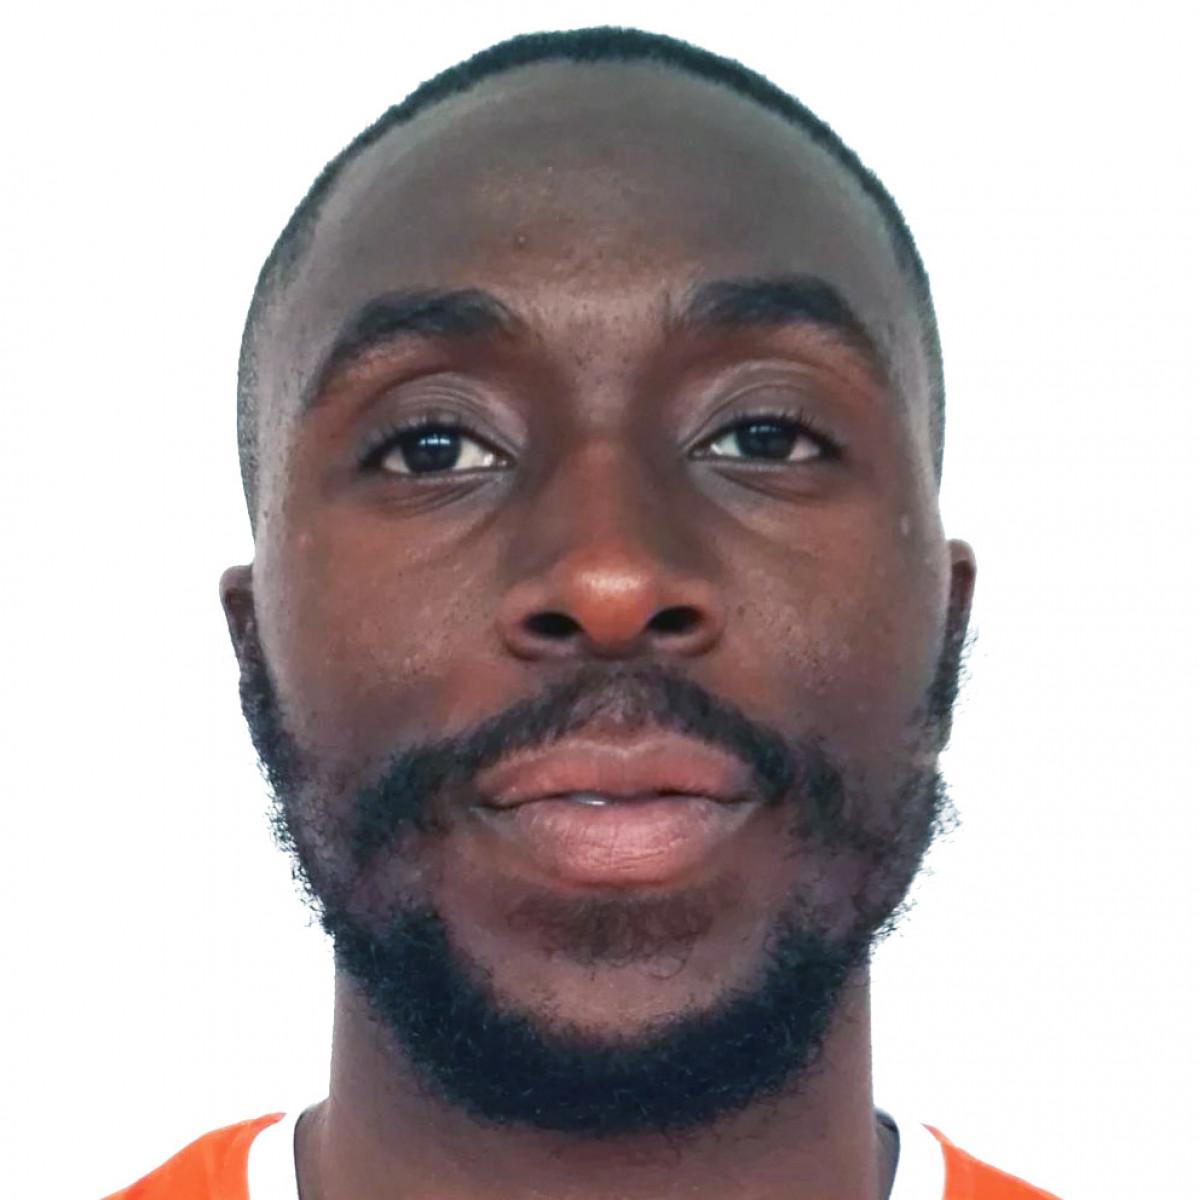 Braxton Ogbueze